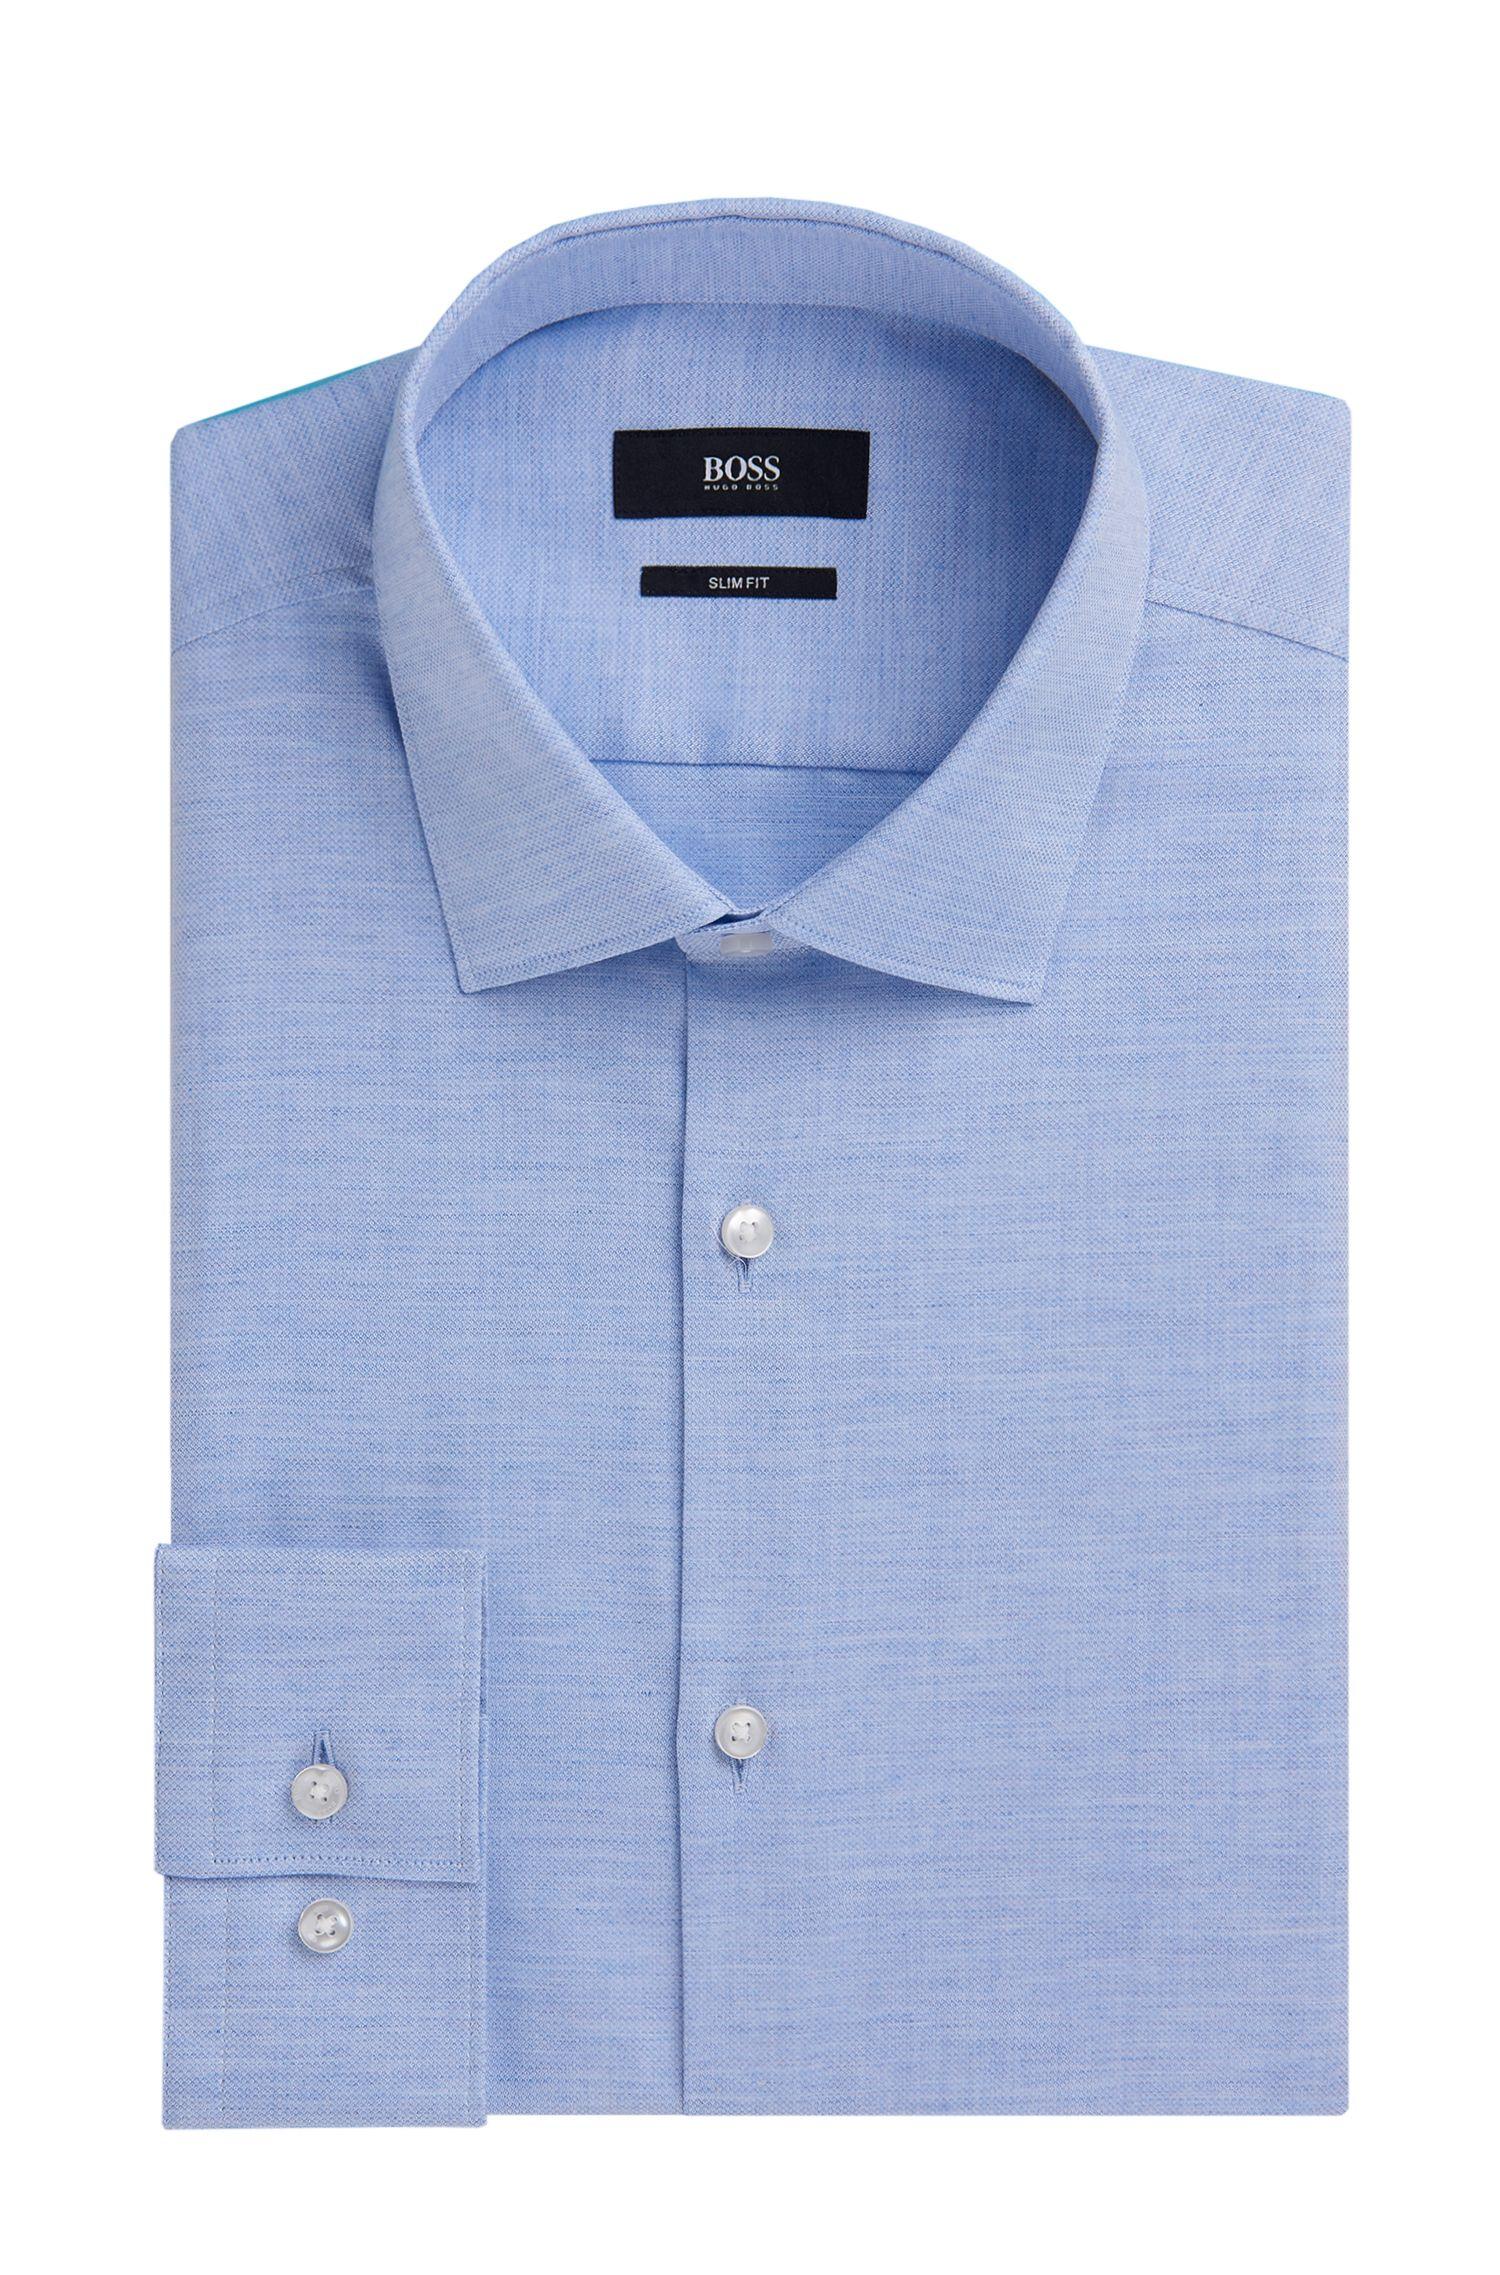 Yarn-Dyed Cotton Oxford Dress Shirt, Slim Fit | Ismo